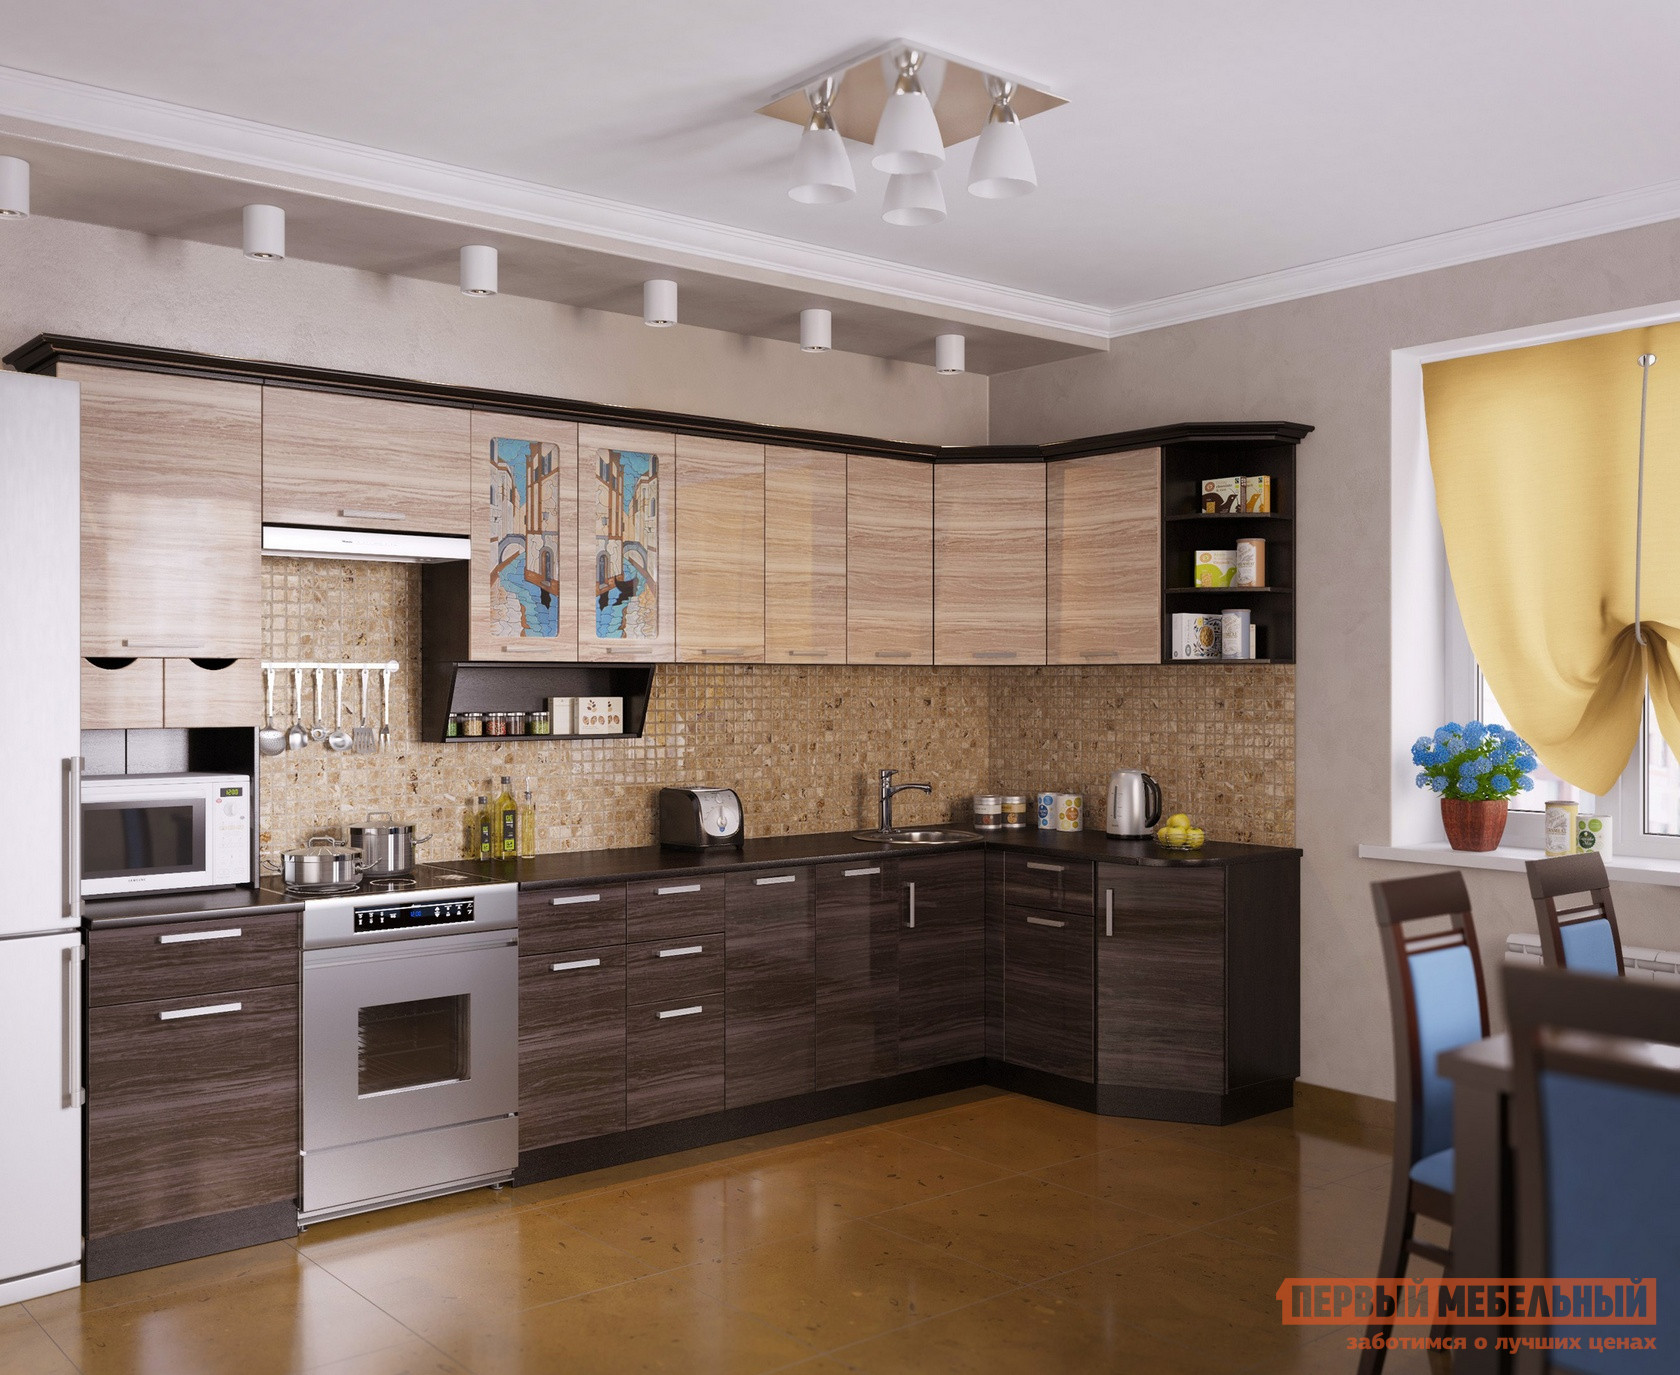 Угловой кухонный гарнитур МО РОСТ Венеция 4 Угол кухонный гарнитур мо рост венеция 2 угол